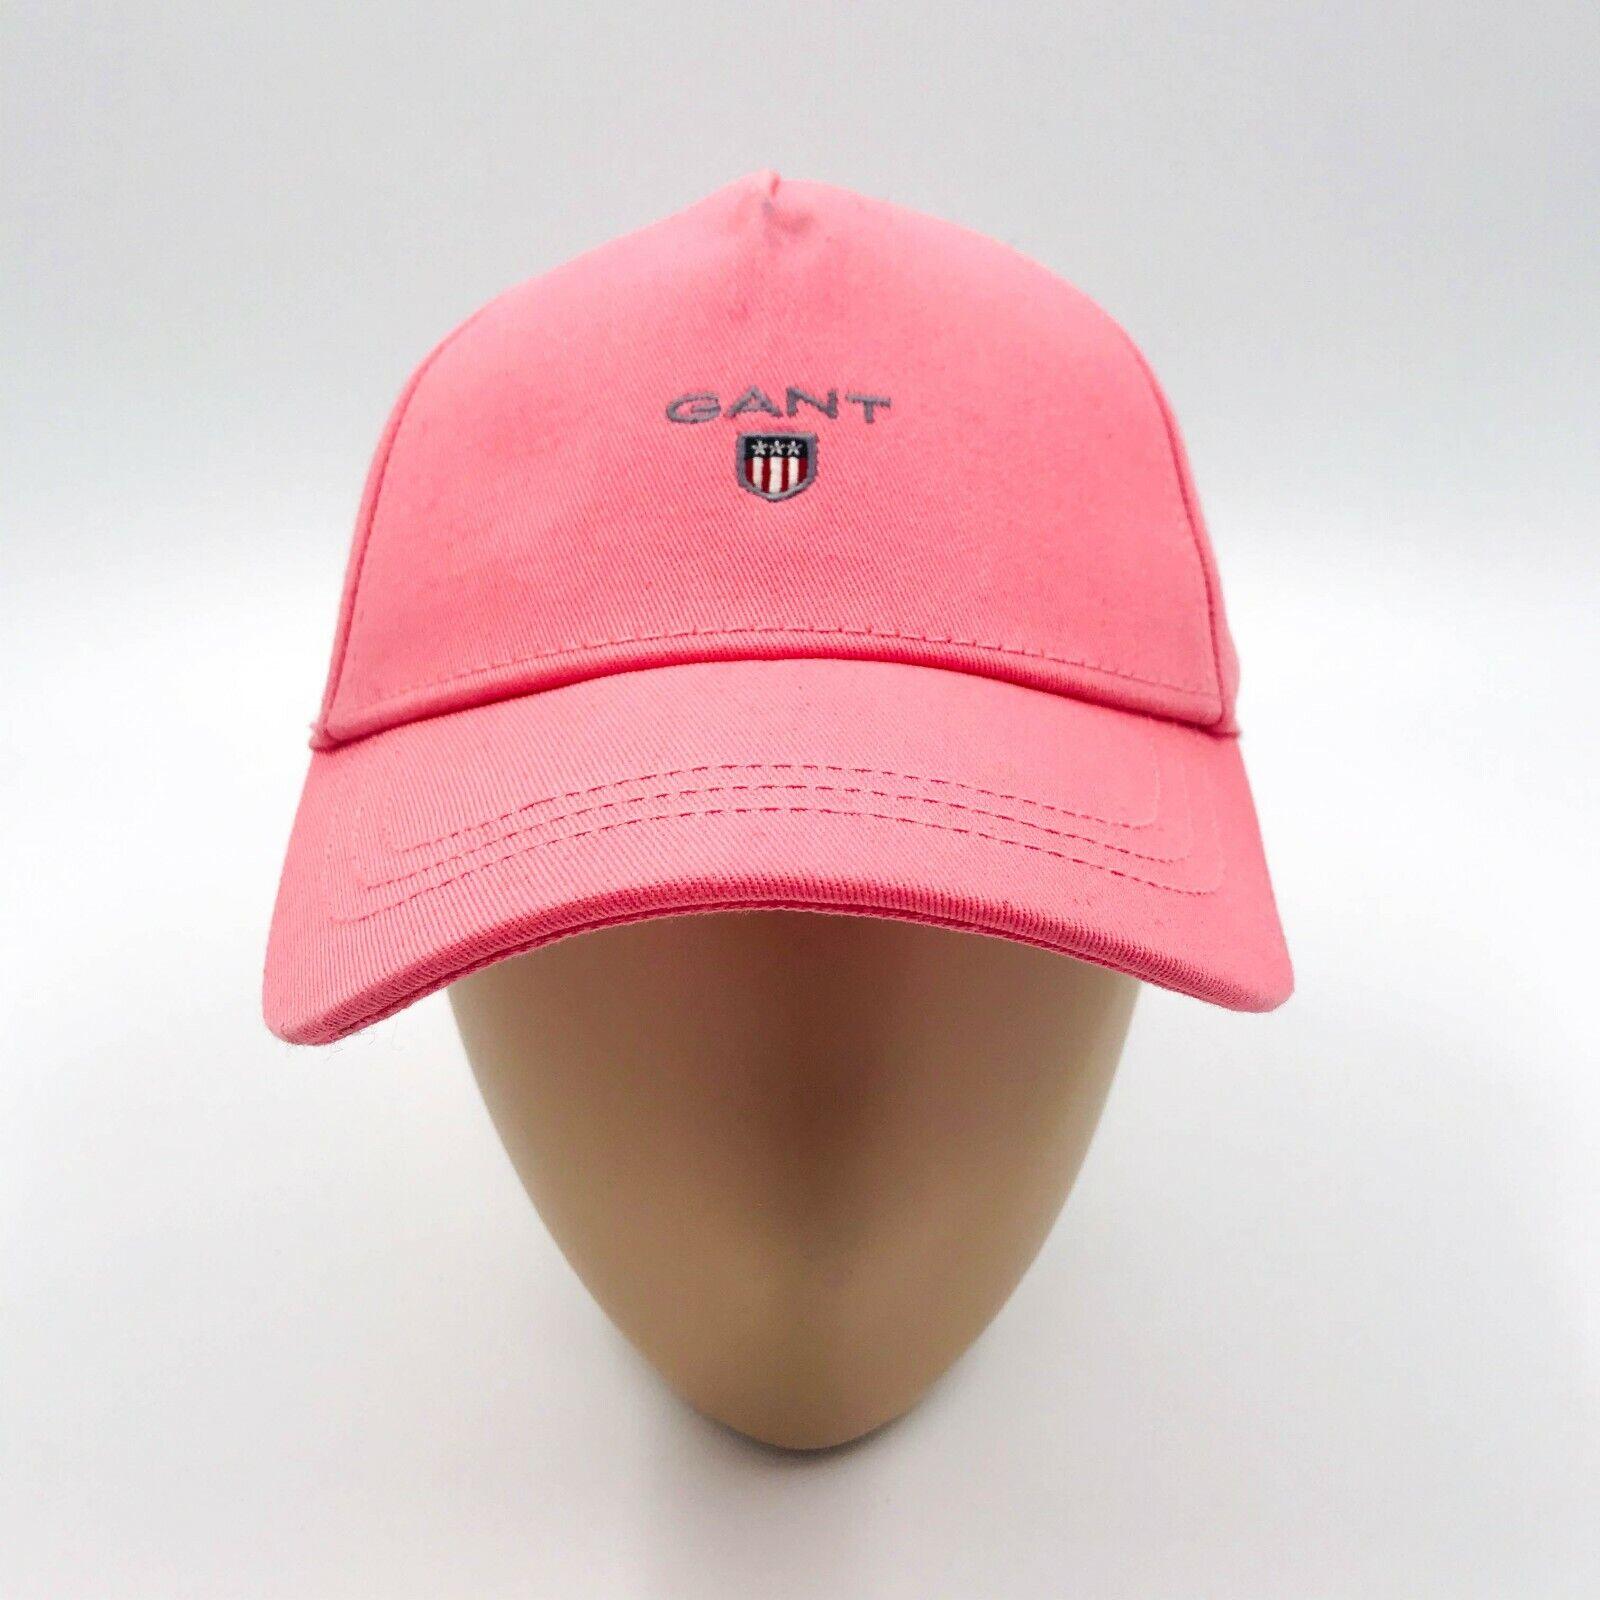 GANT Pink Original Shield Baseballmütze Cap Größe S M